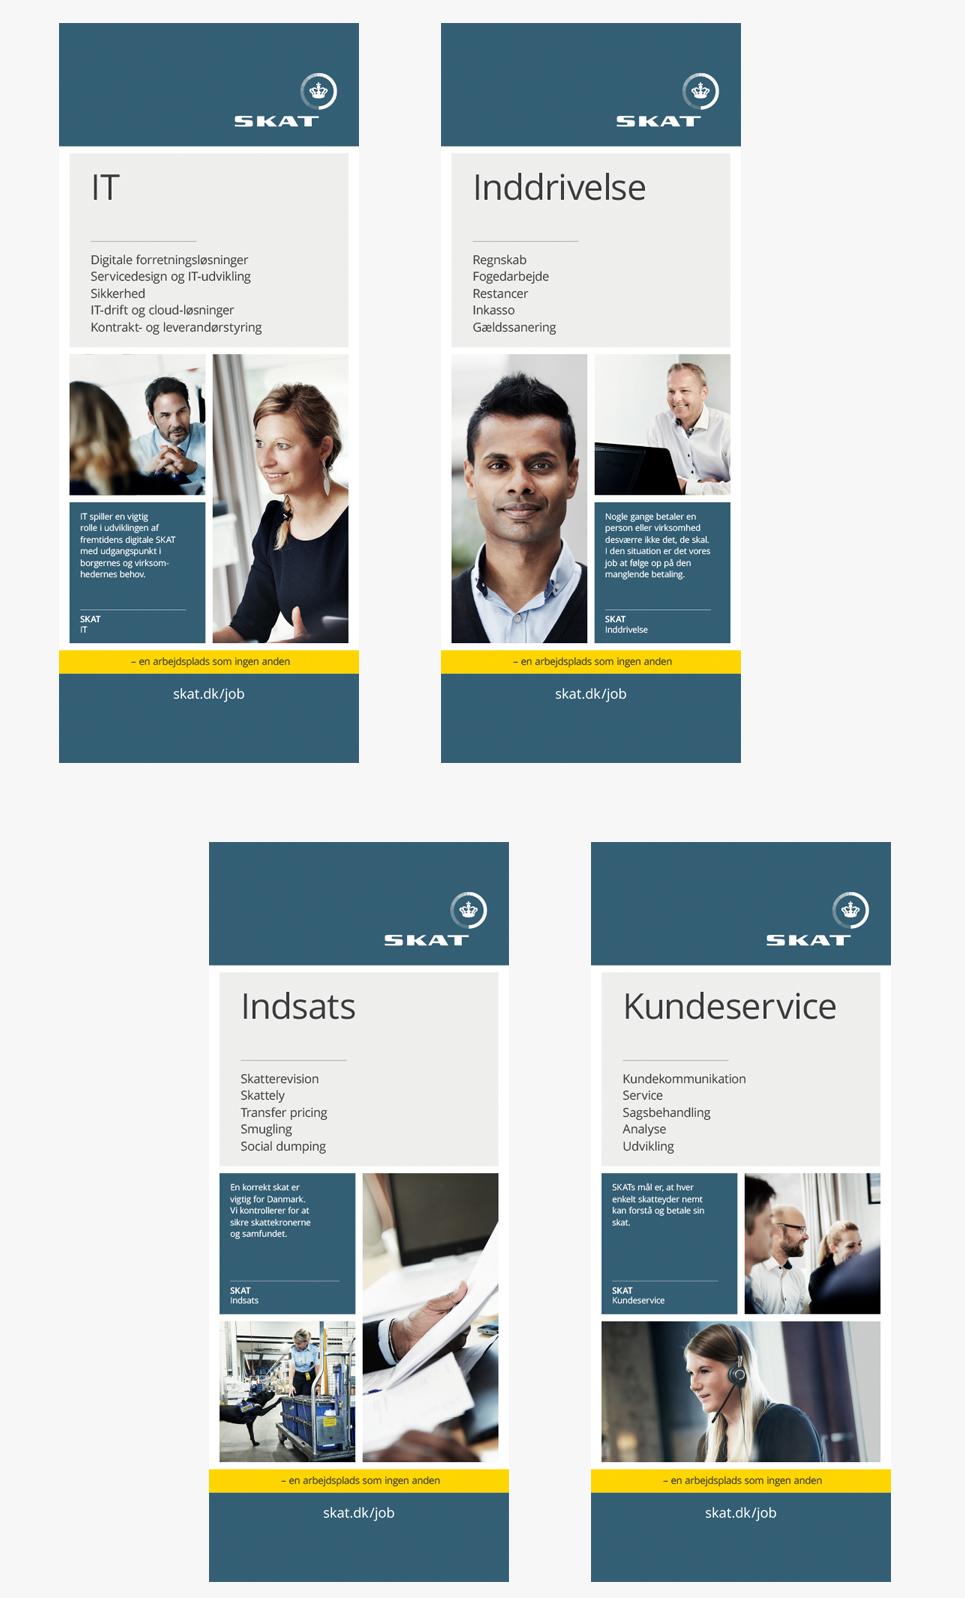 SKAT_employerbranding_07